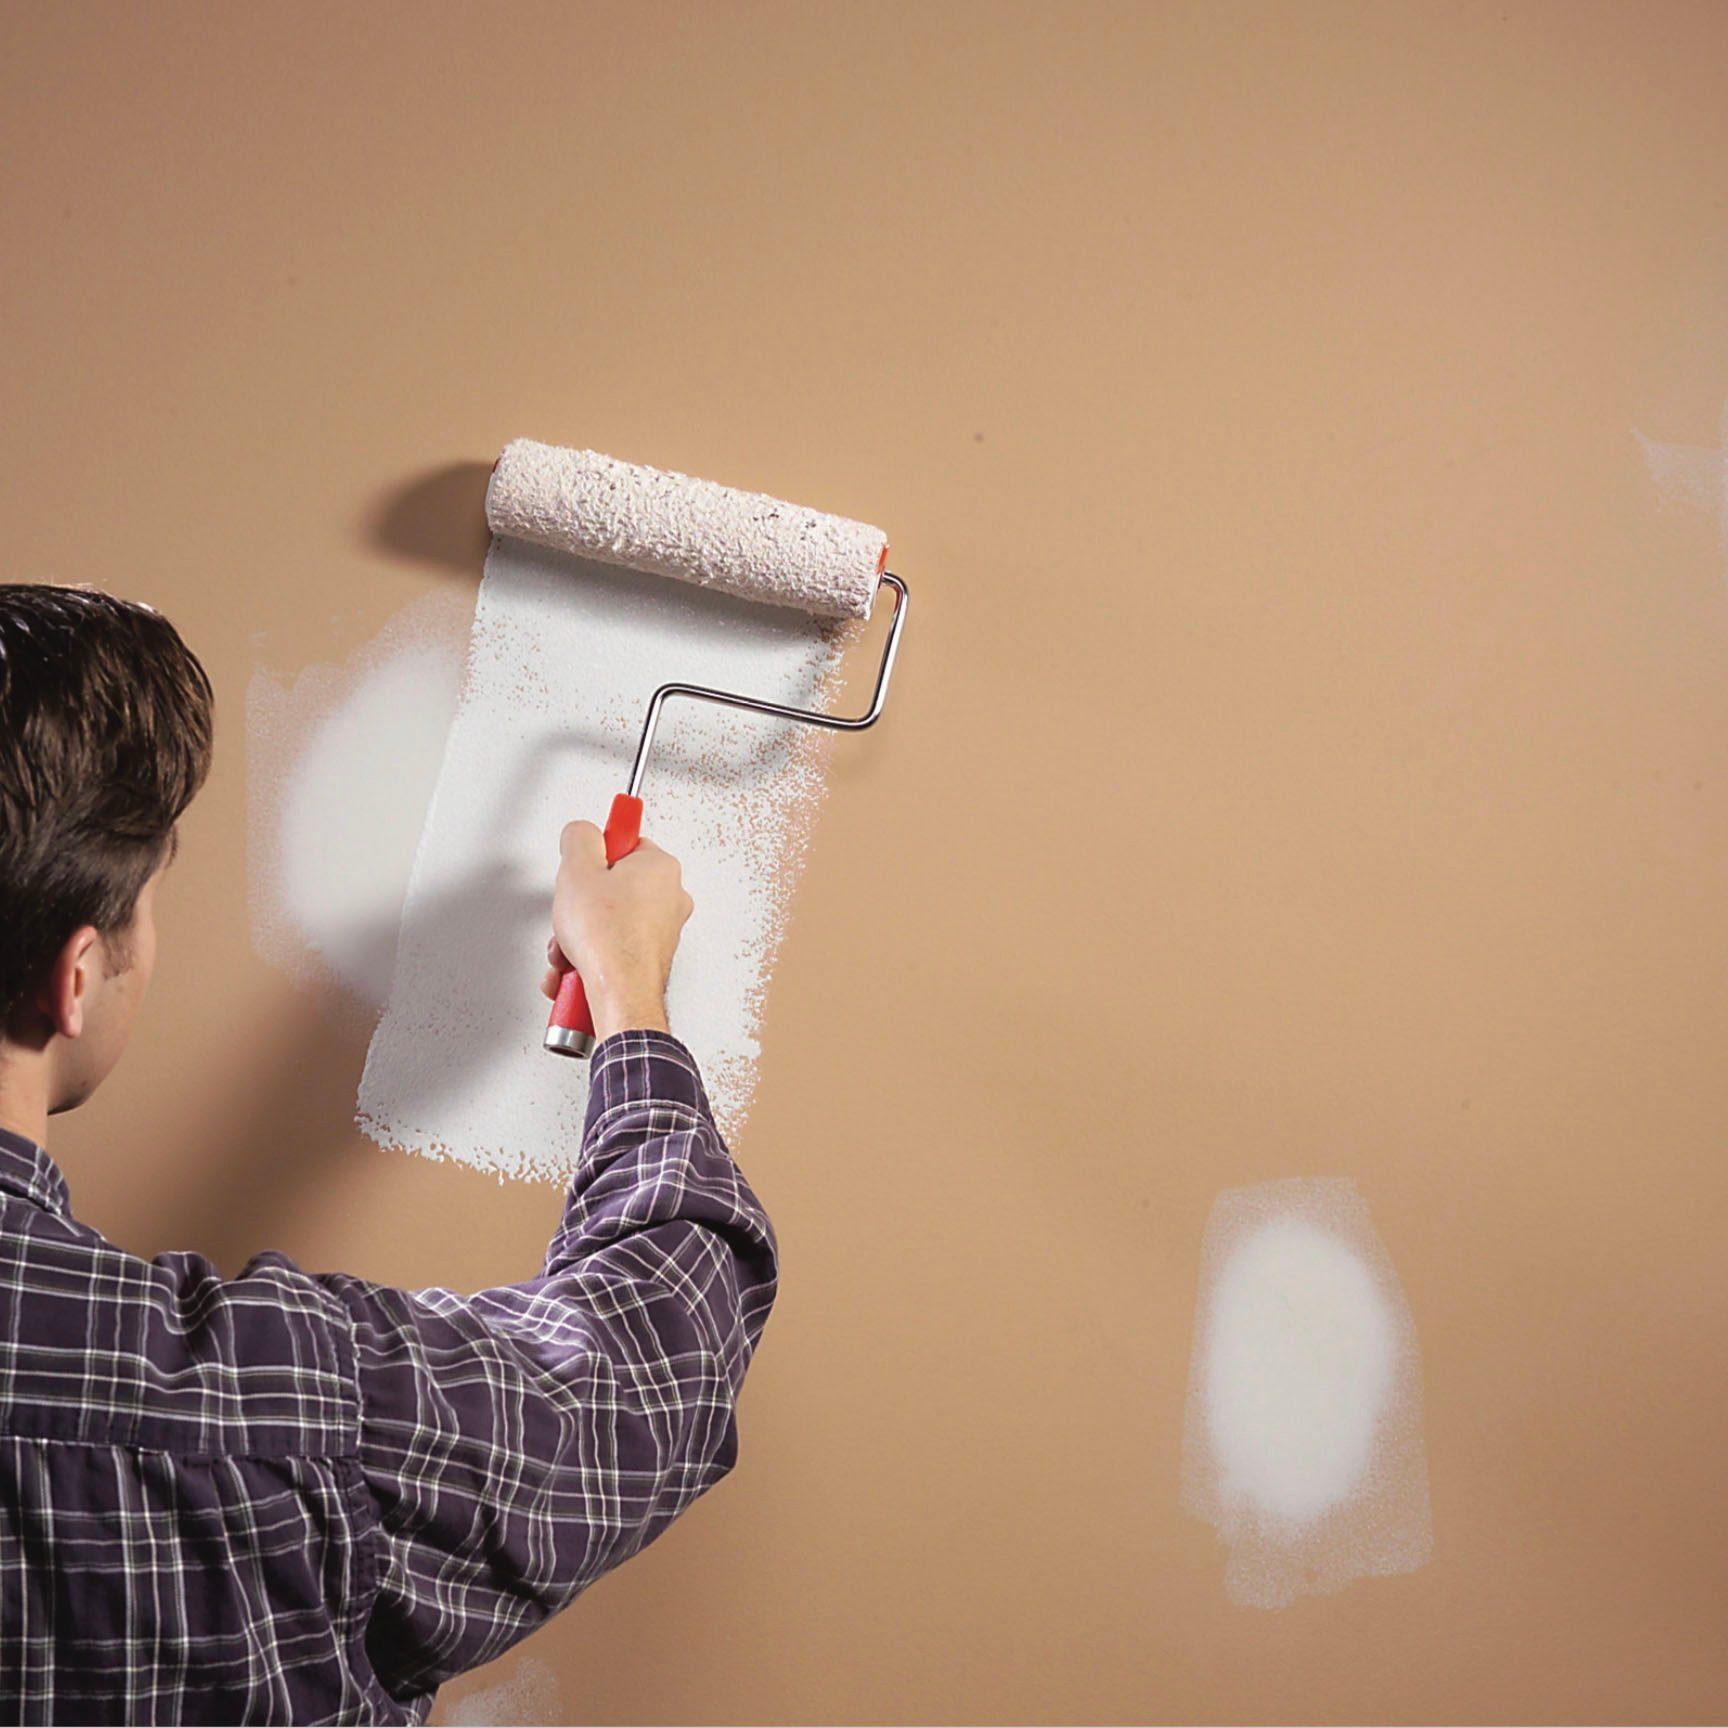 Repairing wall paint